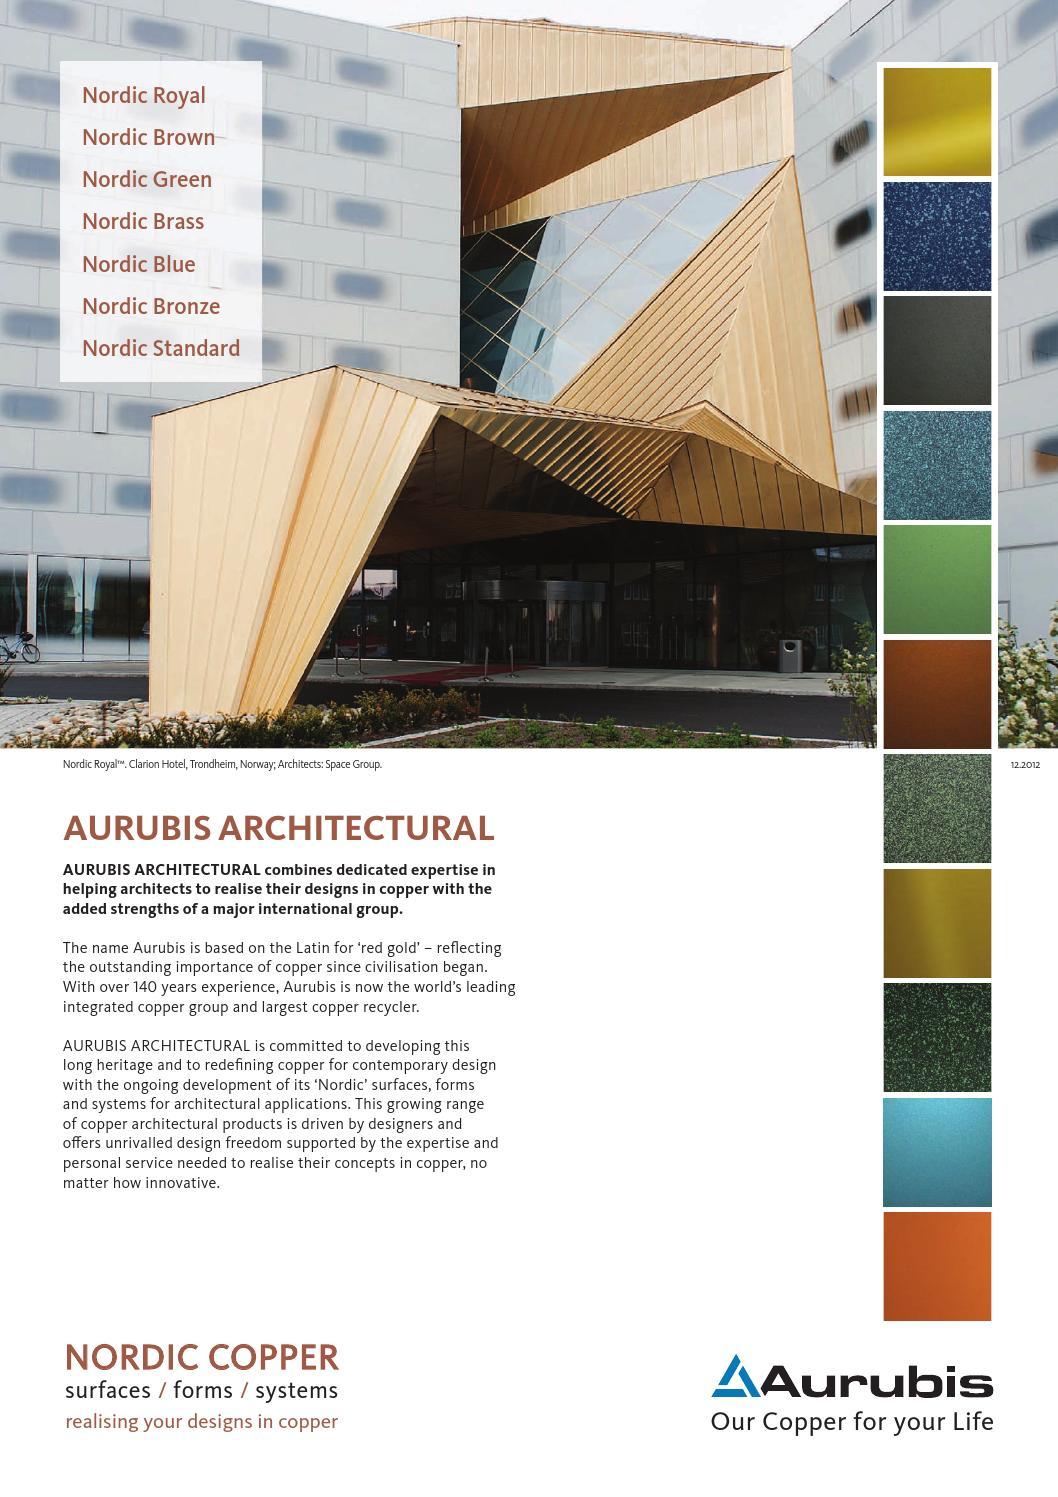 aurubis datasheet nordic products 2014 by aurubis finland. Black Bedroom Furniture Sets. Home Design Ideas